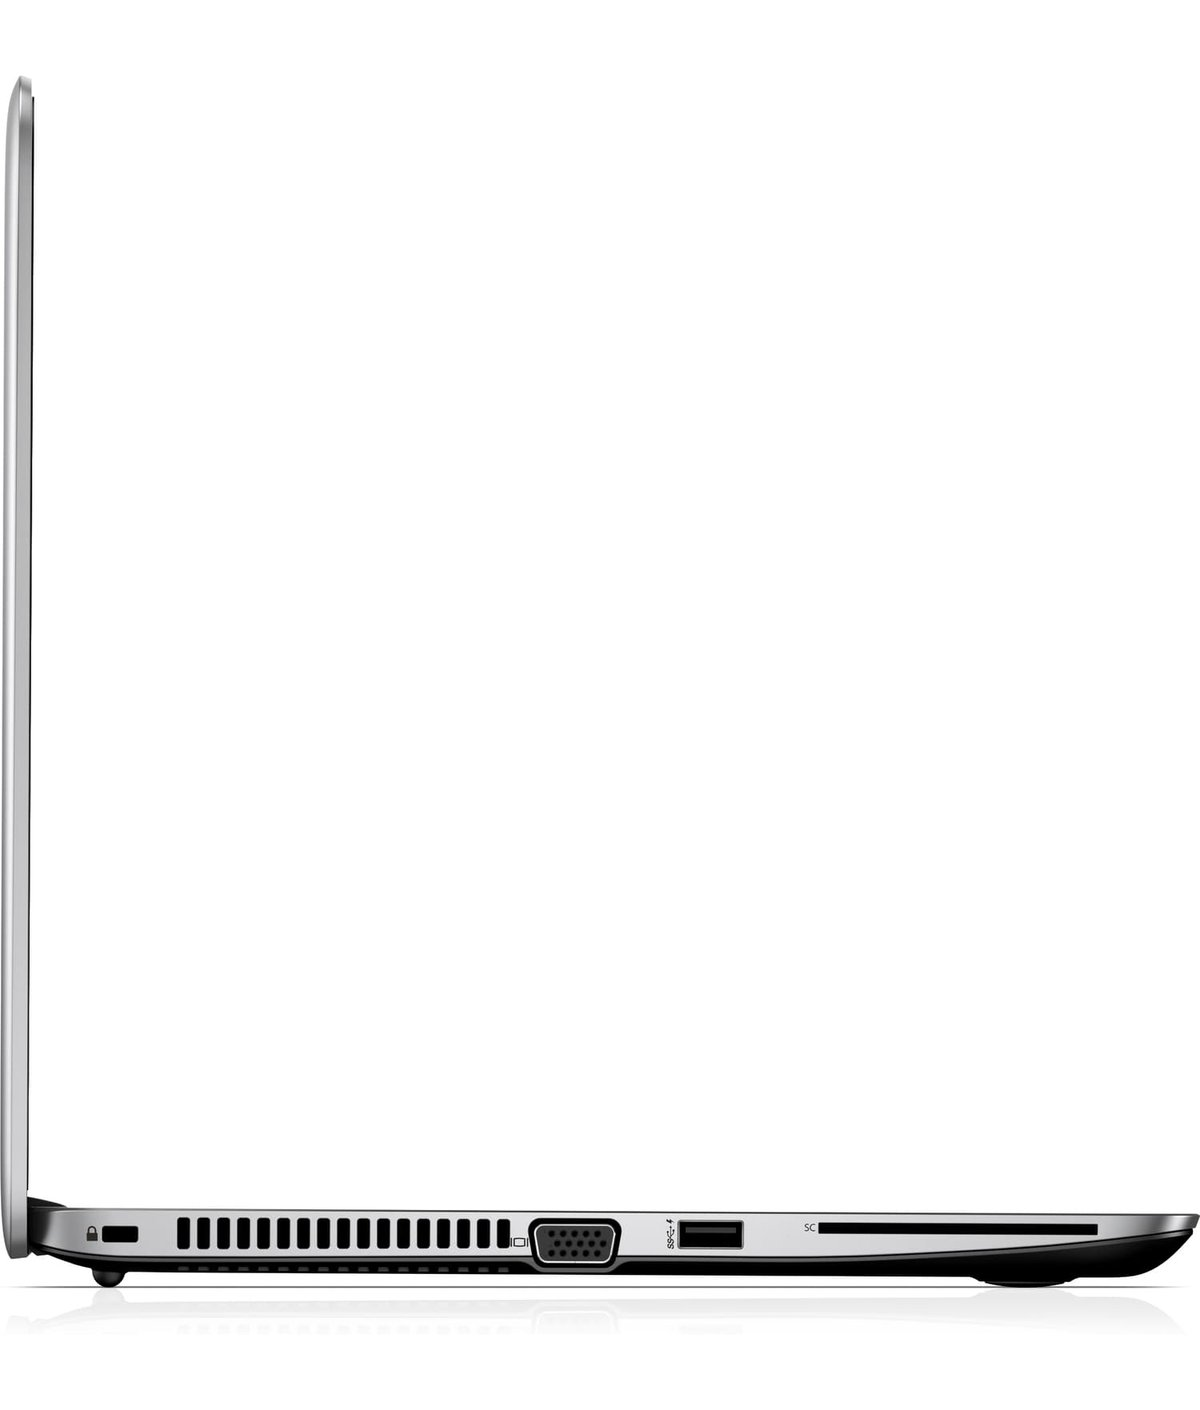 HP EliteBook 840 G3 - Ultrabook | Product Details | shi com